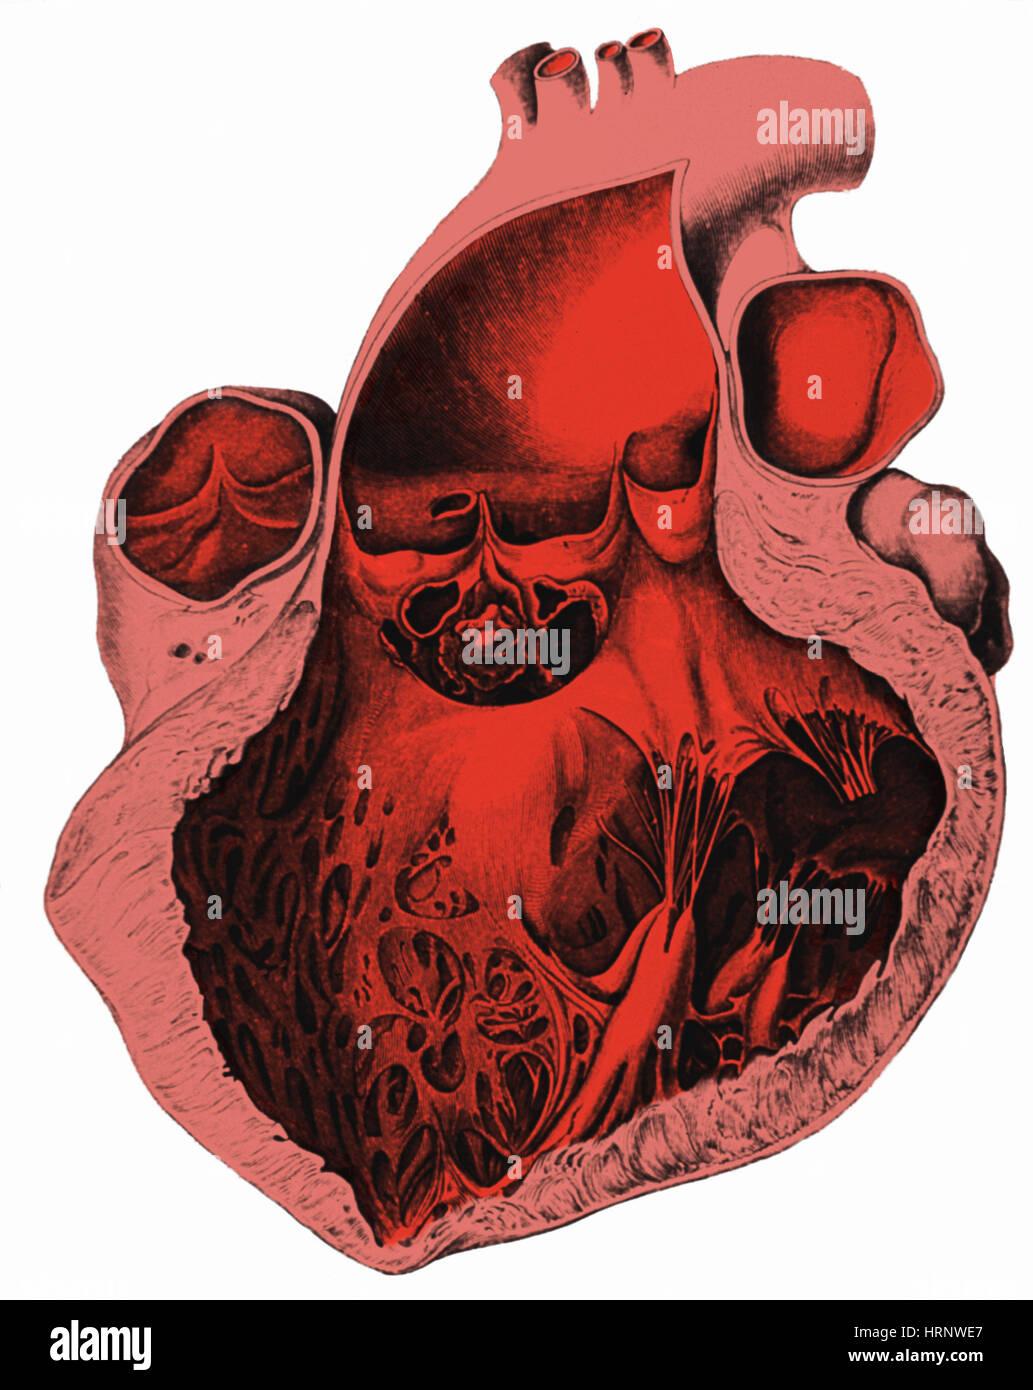 Herz-Anatomie, Carl von Rokitansky, 1875 Stockbild